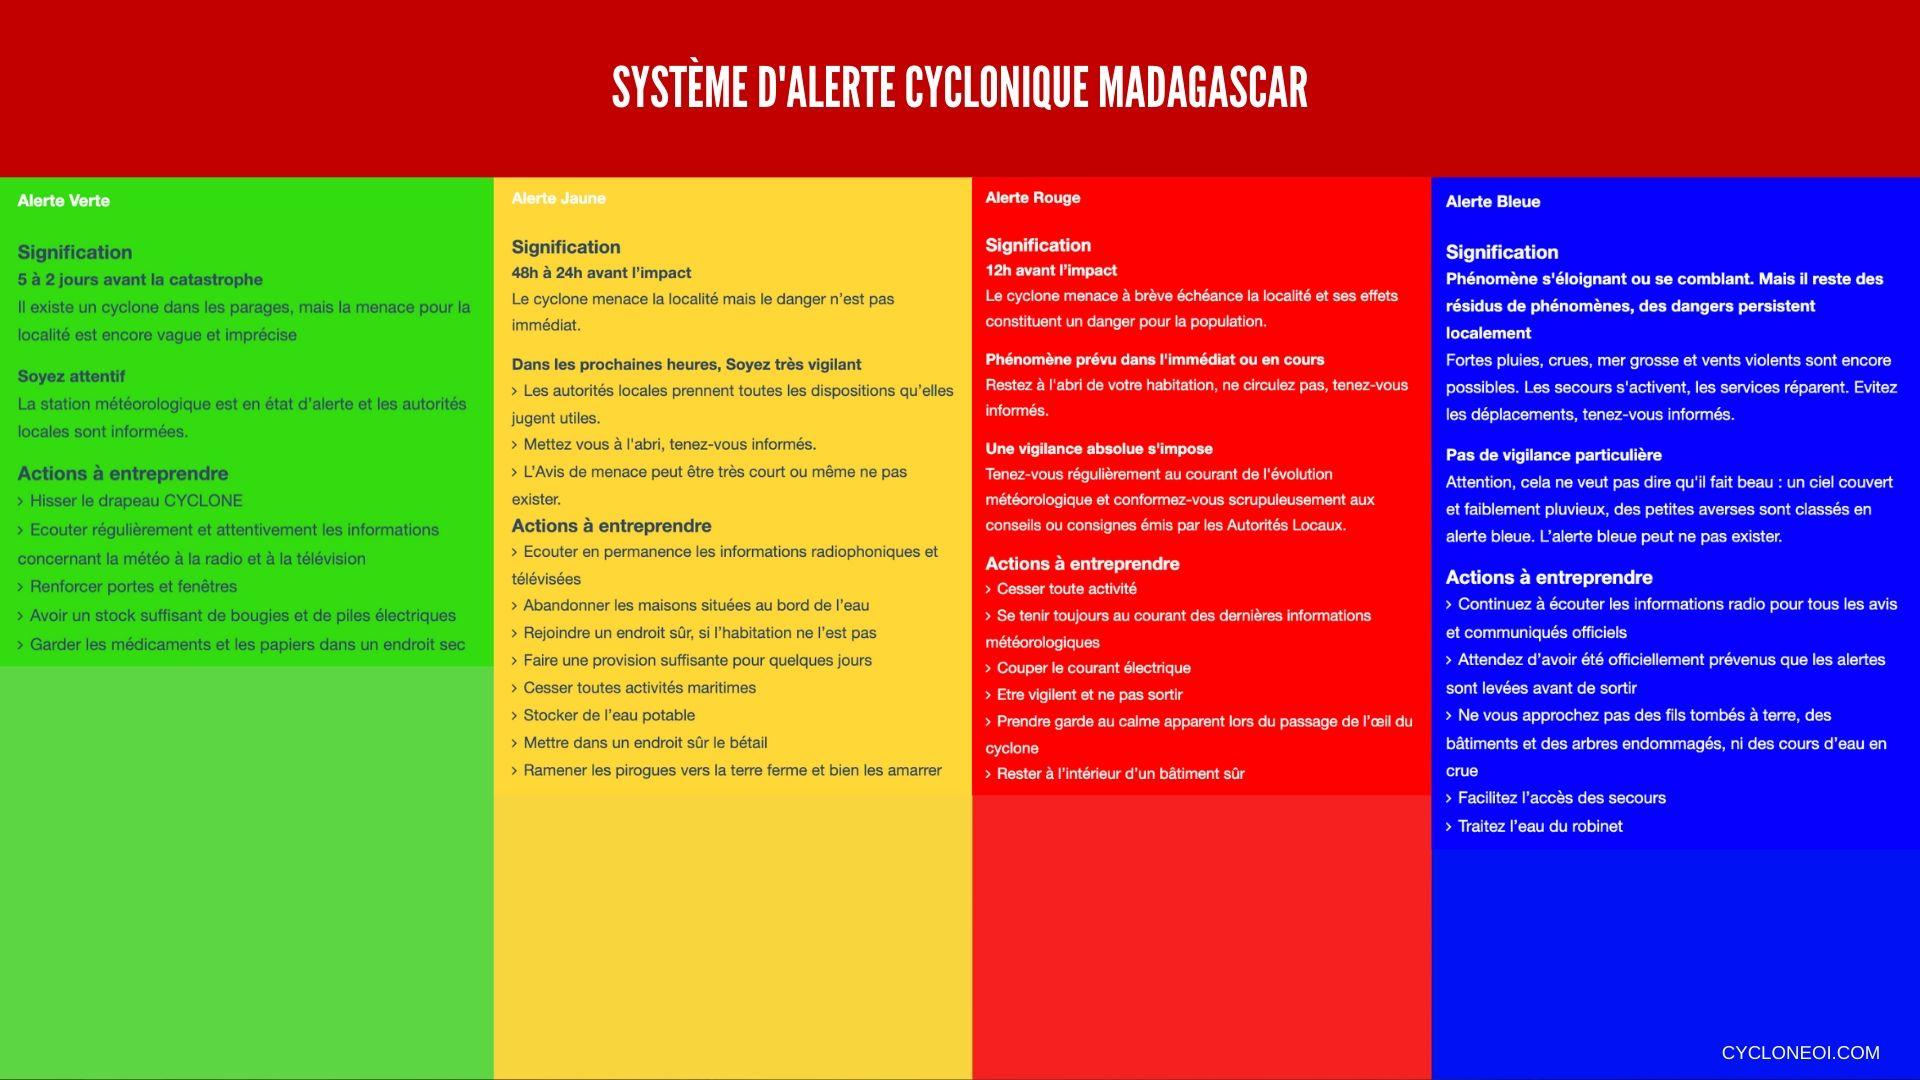 Systeme alerte cyclonique madagascar